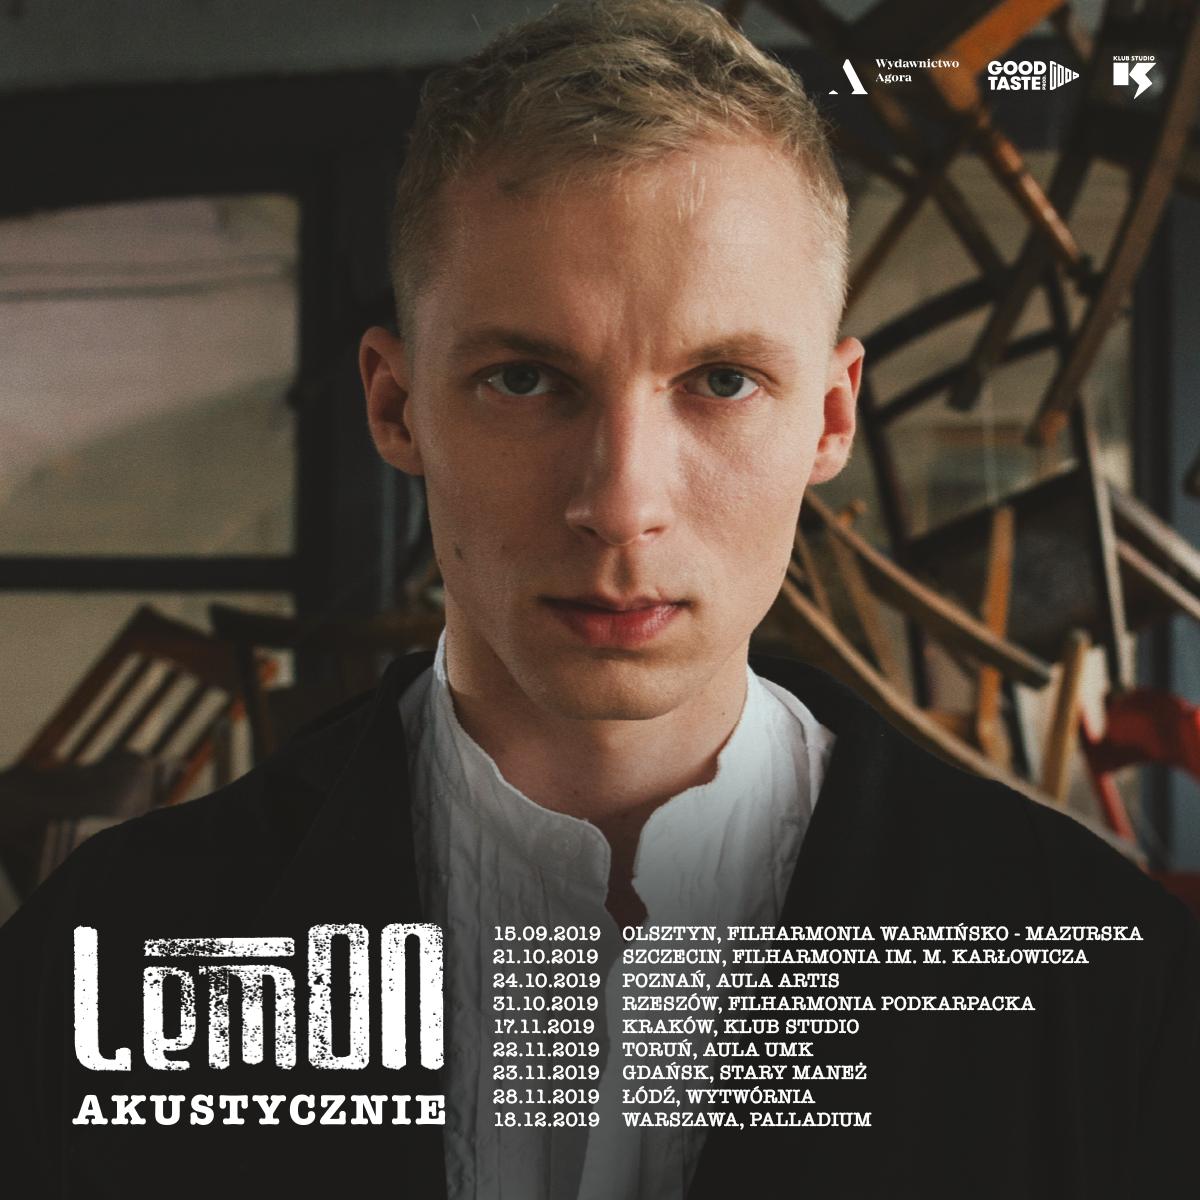 Lemon trasa 2019